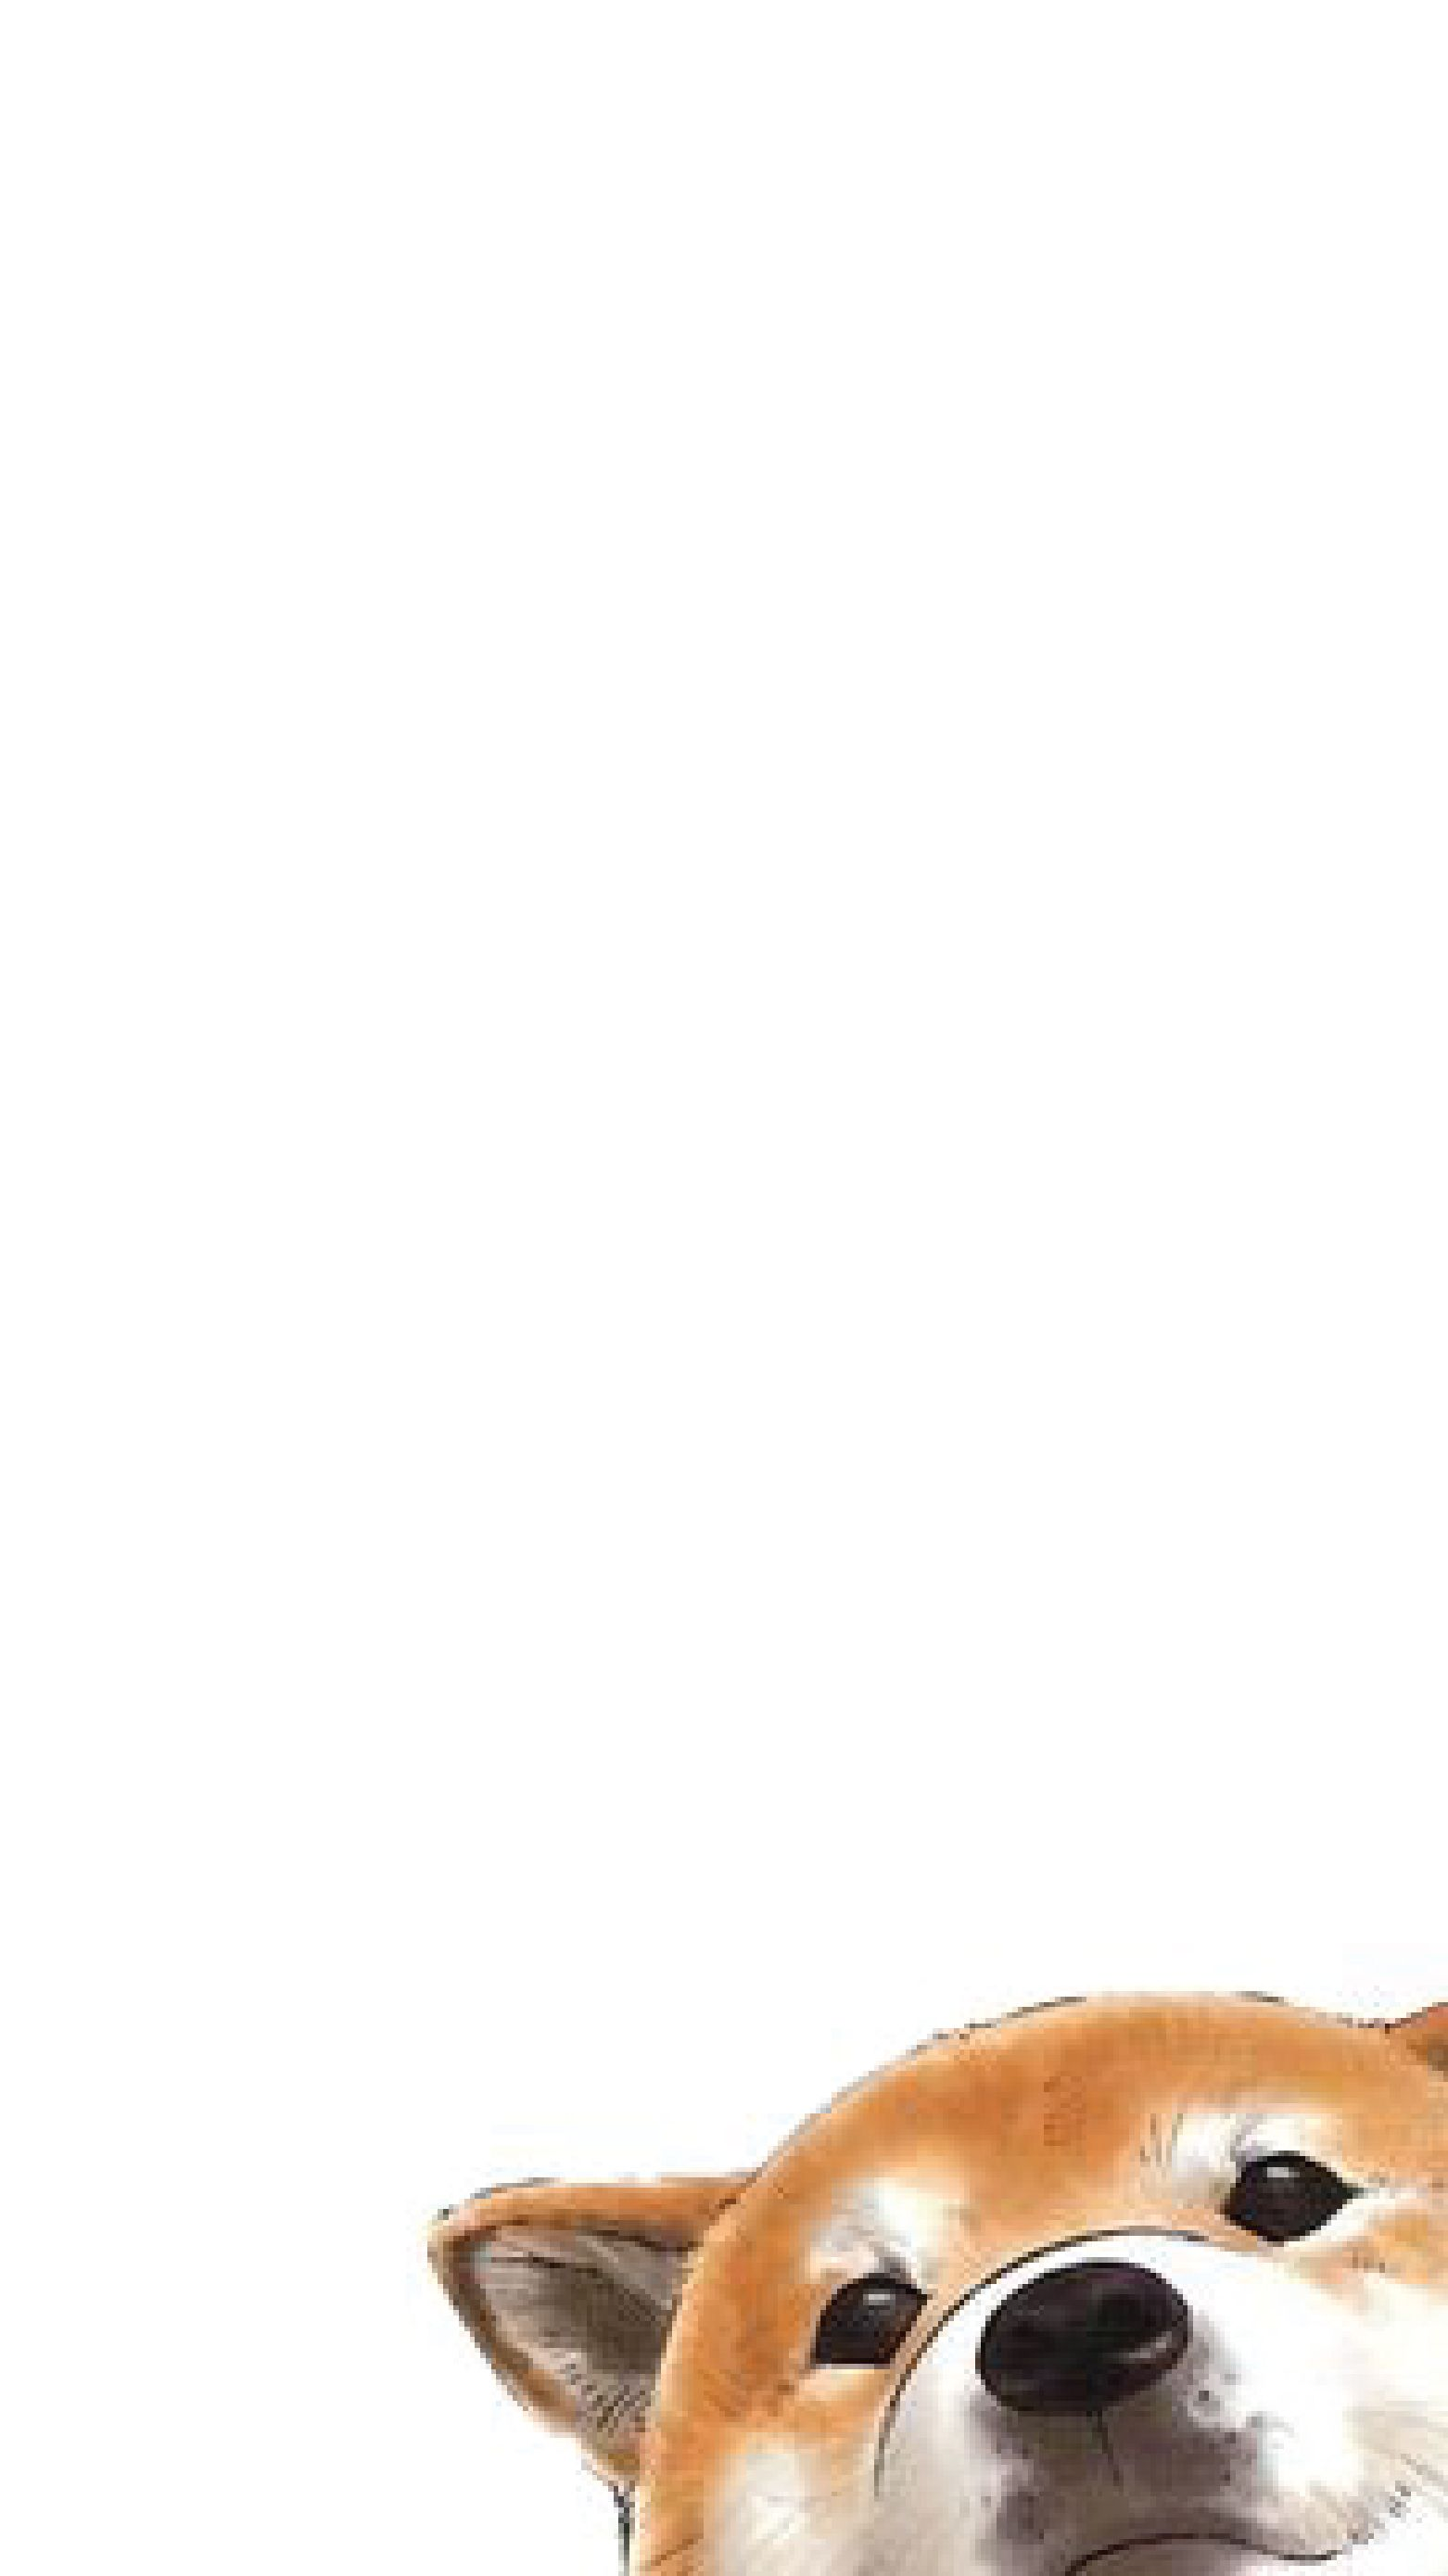 Peak A Boo Phone Wallpaper In 2019 Cute Dog Wallpaper Dog